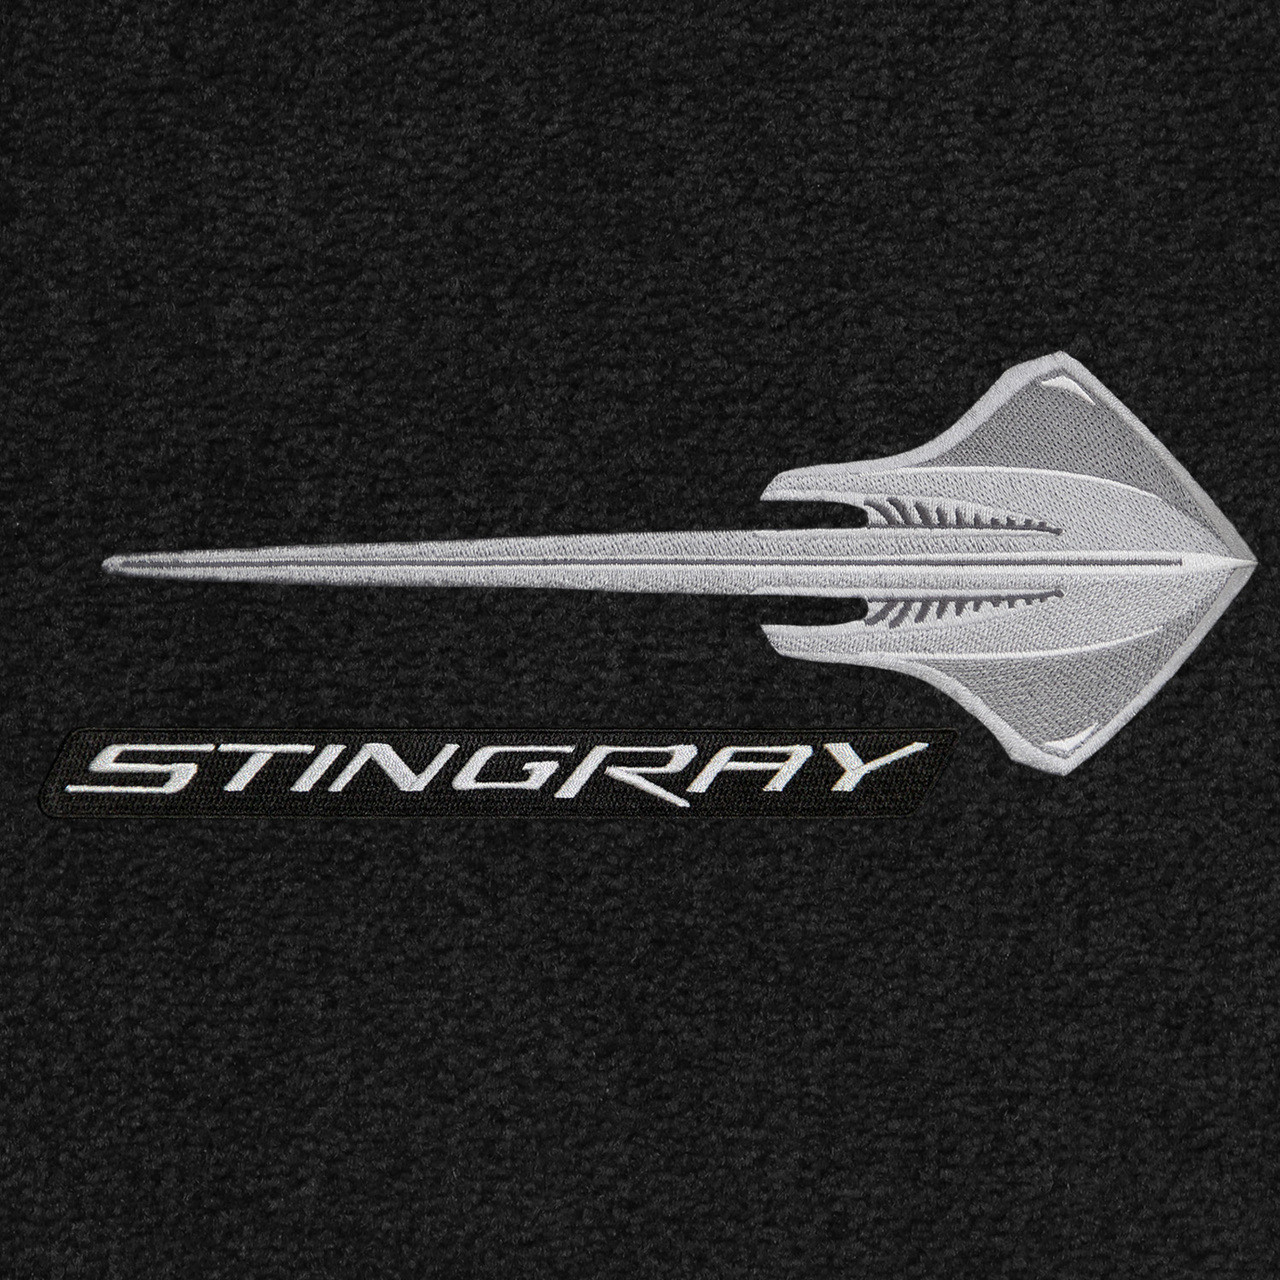 C7 Silver Stingray w/ Silver Stingray Lettering, Ebony Mat